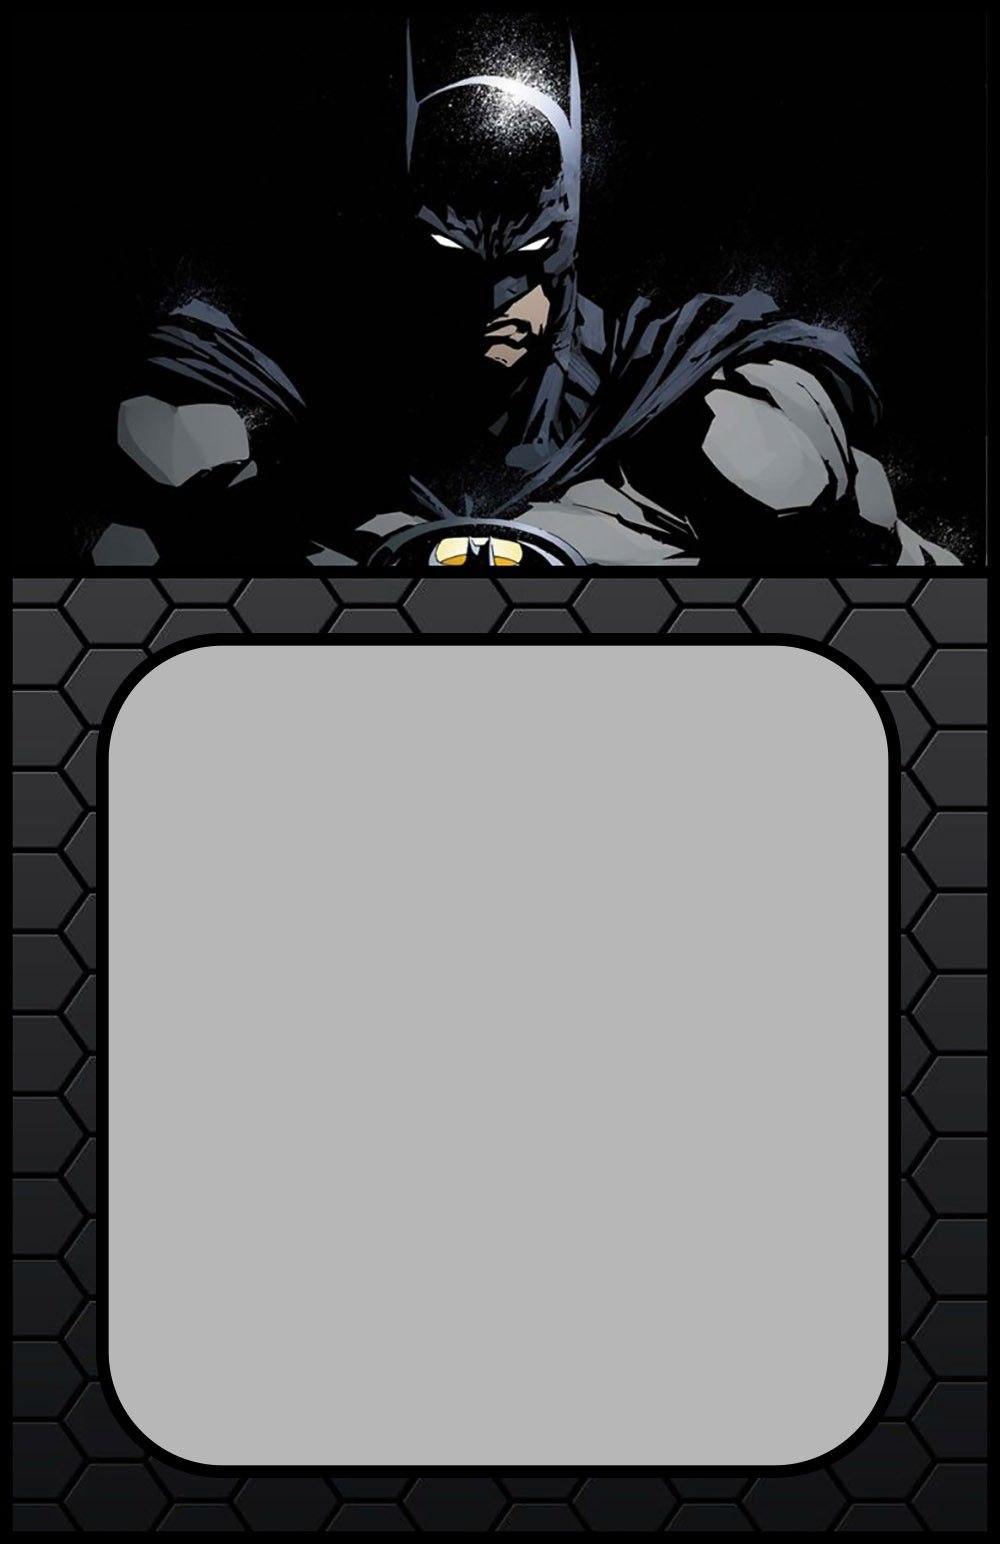 Printable Batman Invitation Card  Coolest Invitation Templates For Batman Birthday Card Template